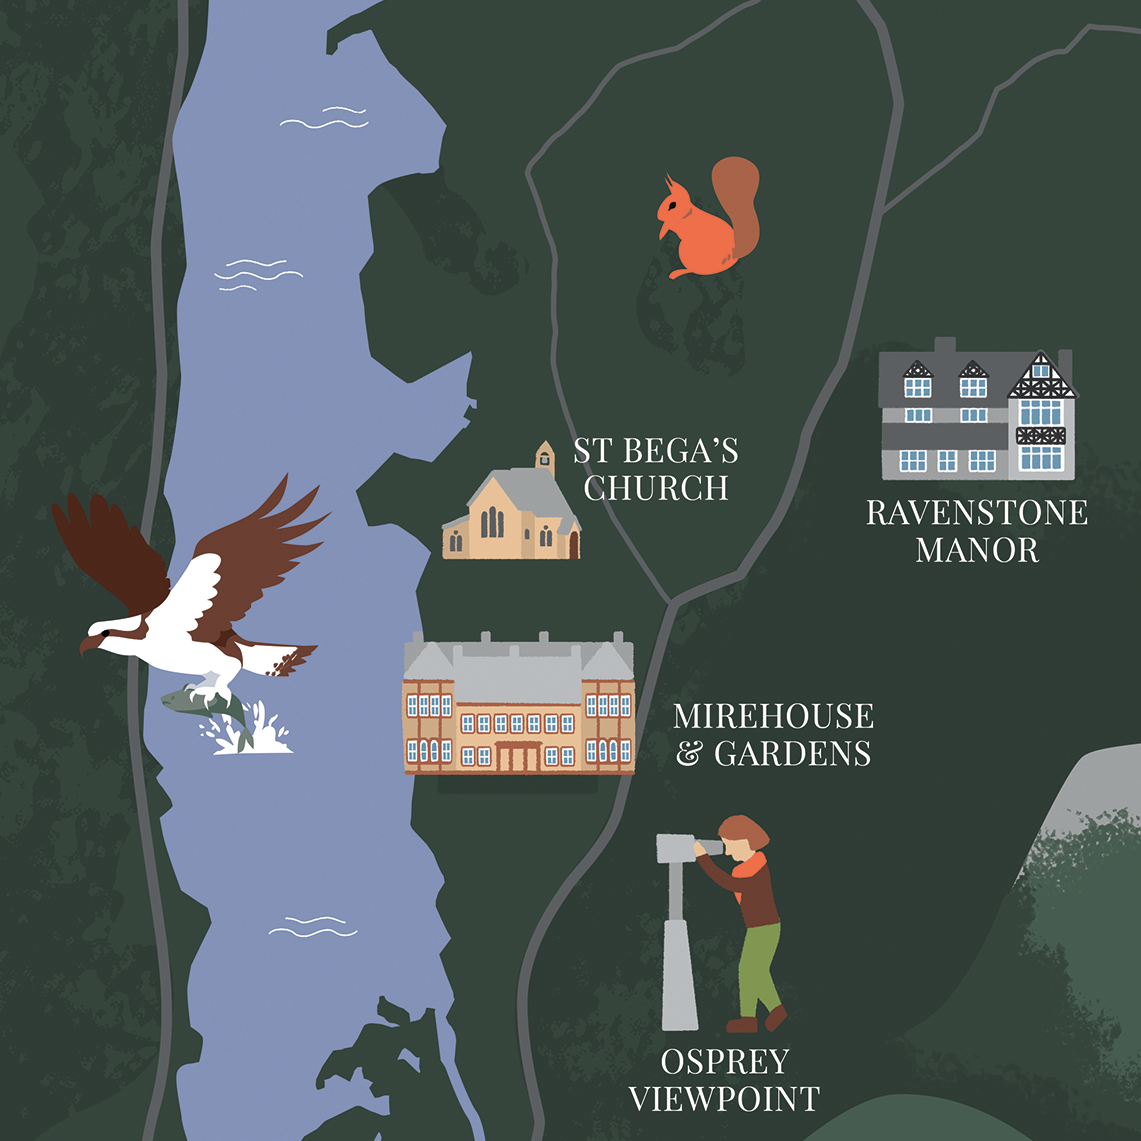 RavenstoneManor_Map_Detail_02.png